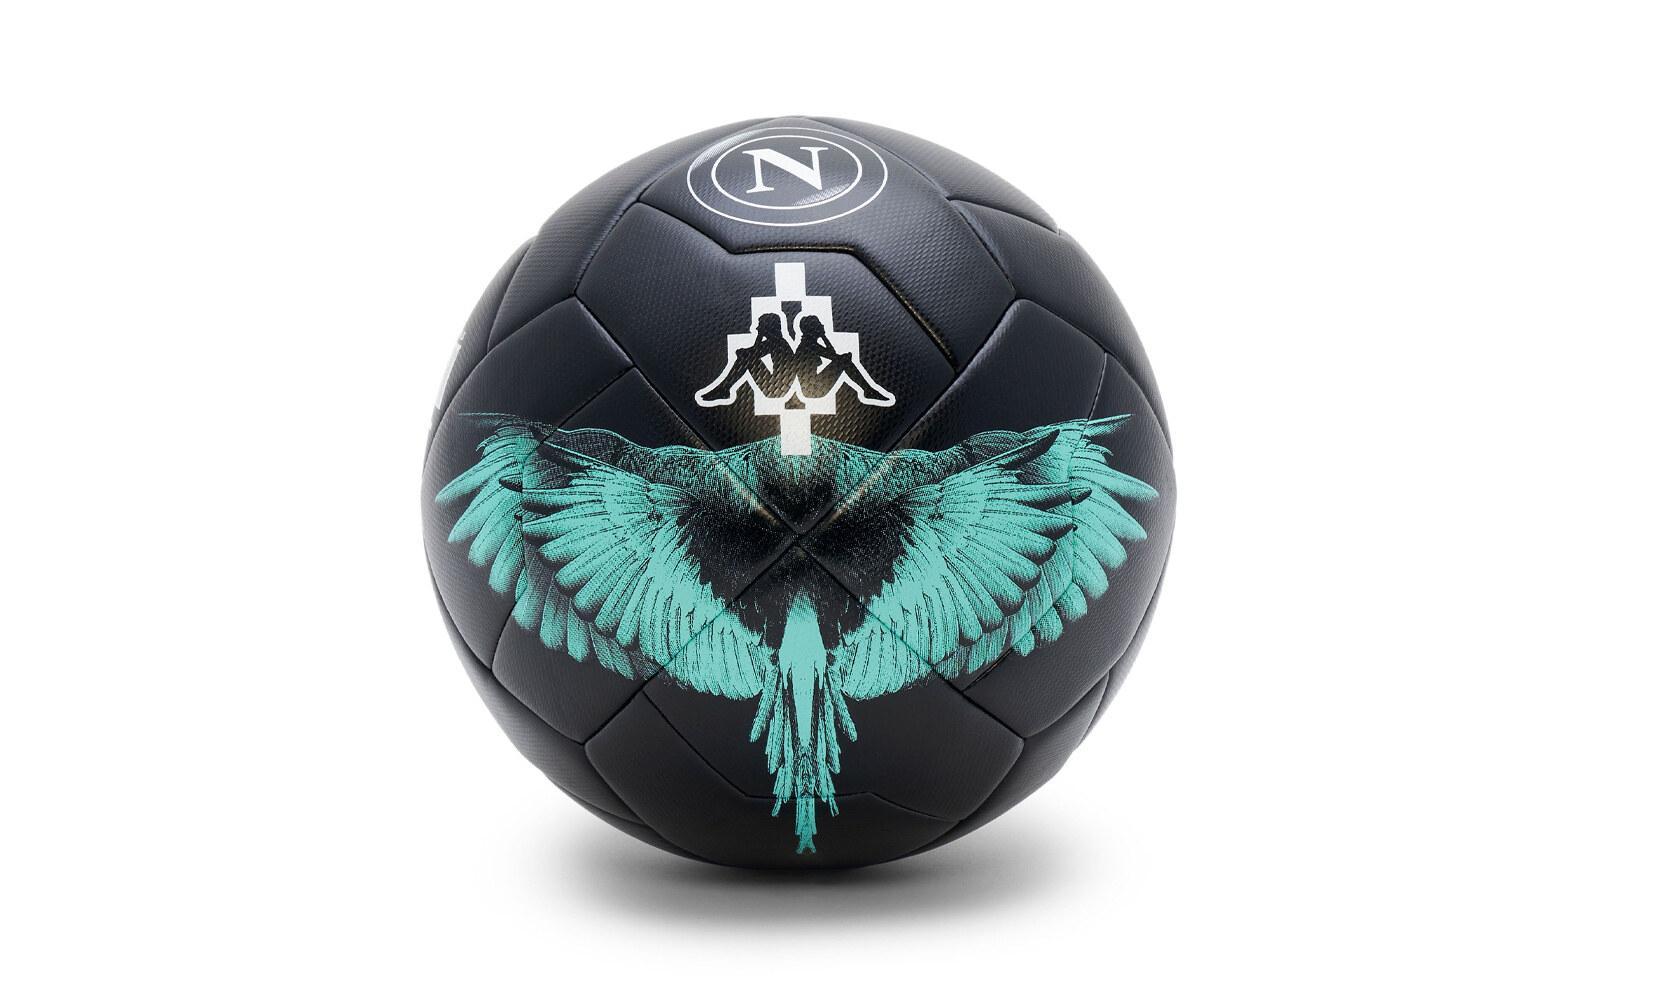 Marcelo Burlon Kappa x SSC Napoli Ball